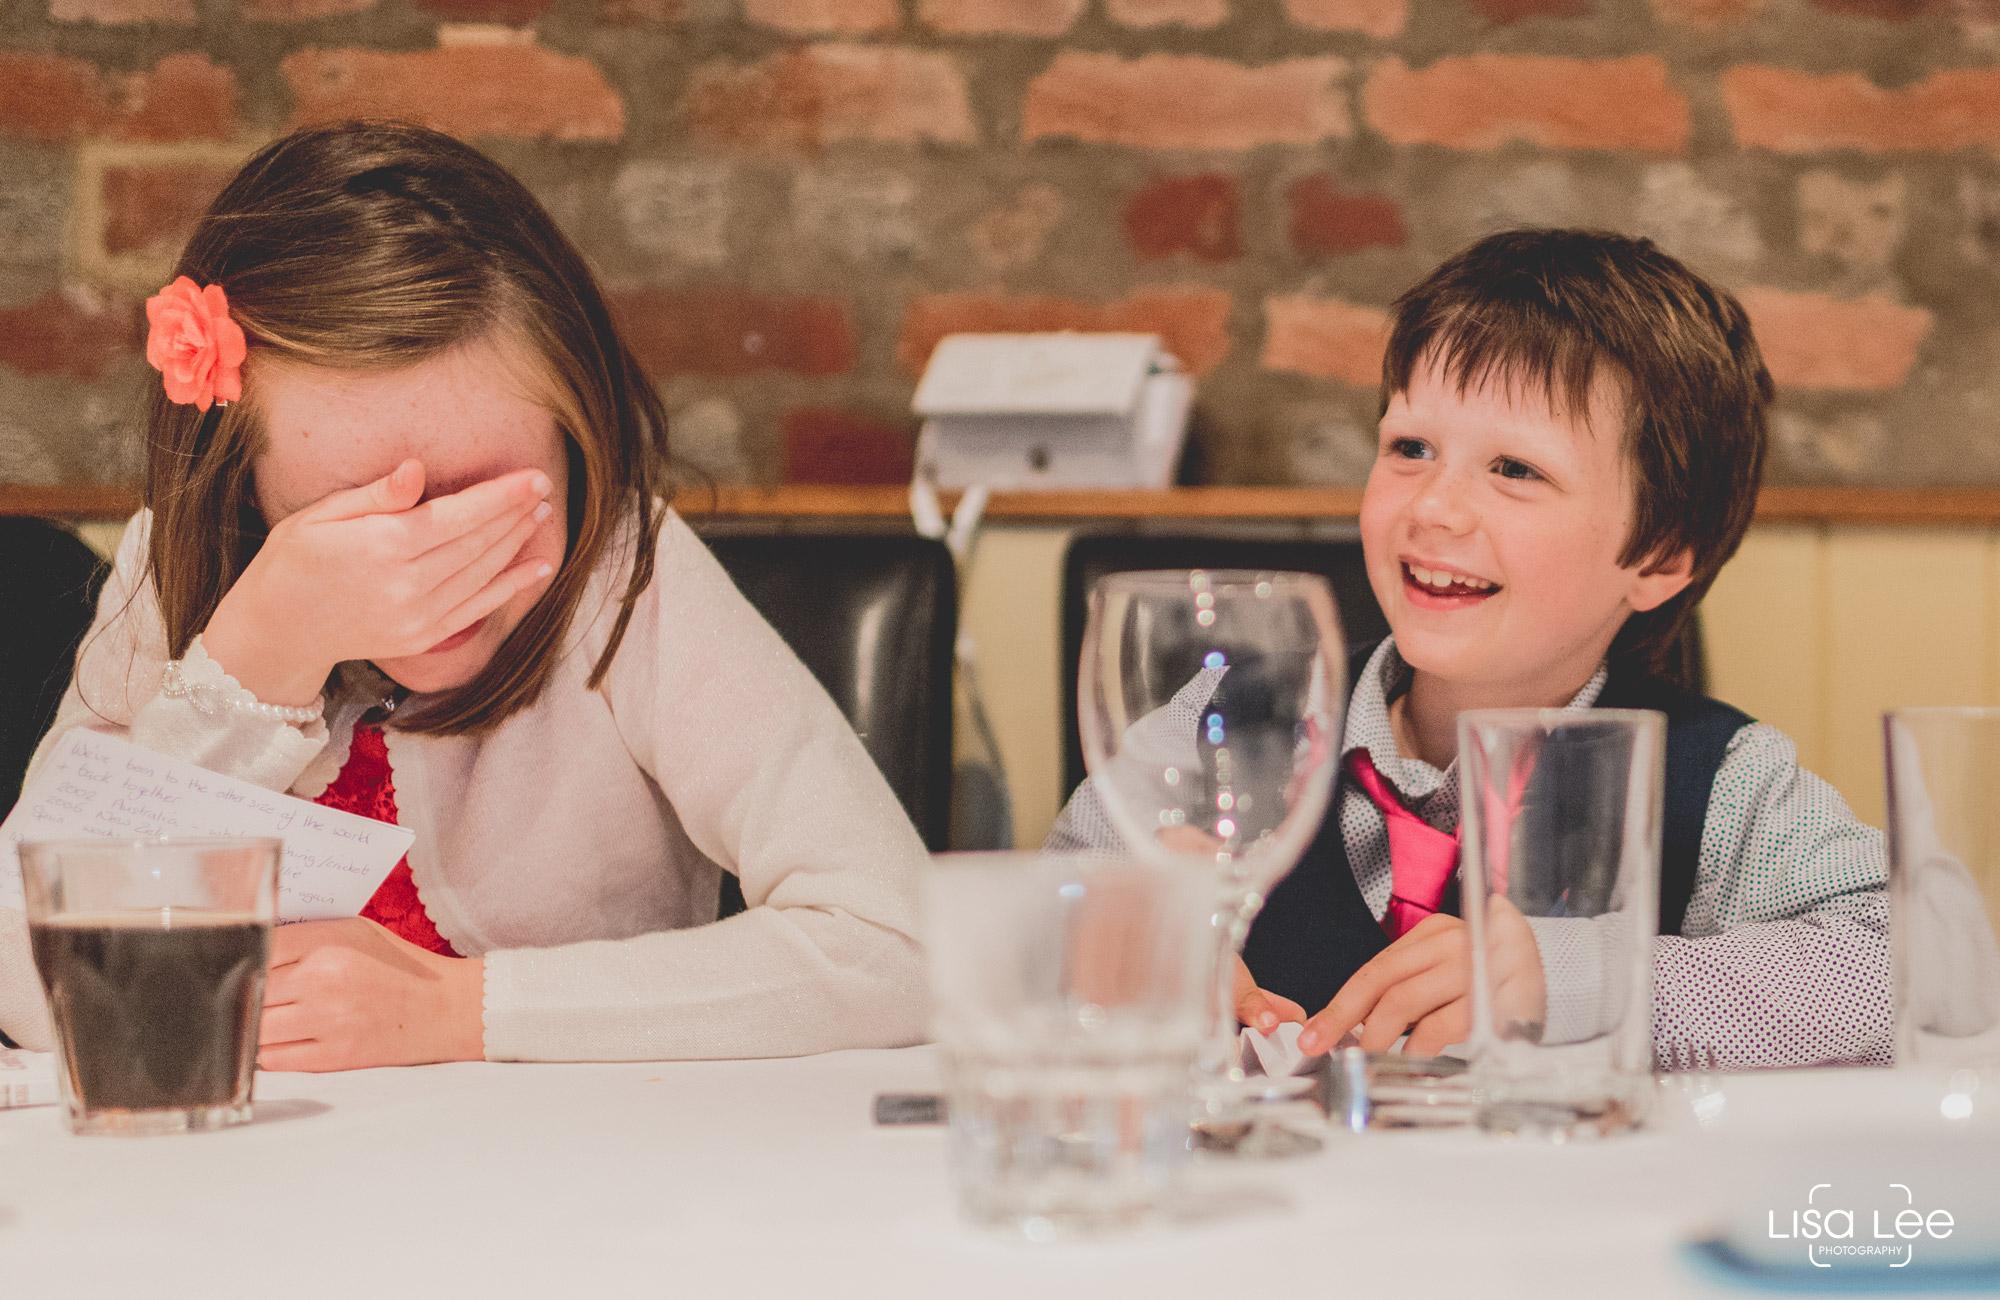 lisa-lee-wedding-photography-burton-kids.jpg